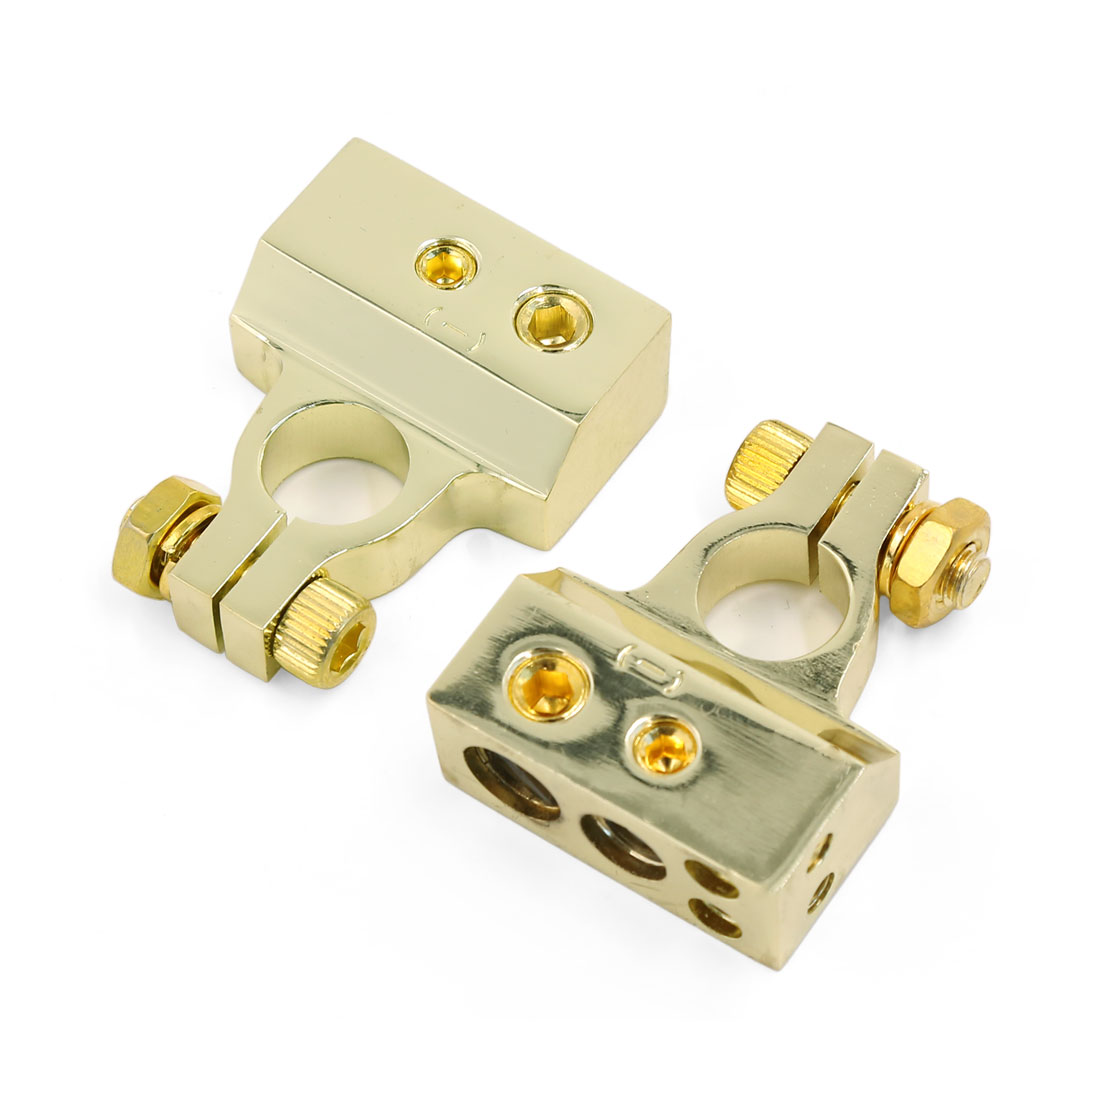 2 Pcs Gold Tone Negative Car Audio Battery Terminals Clamp Connector Posts